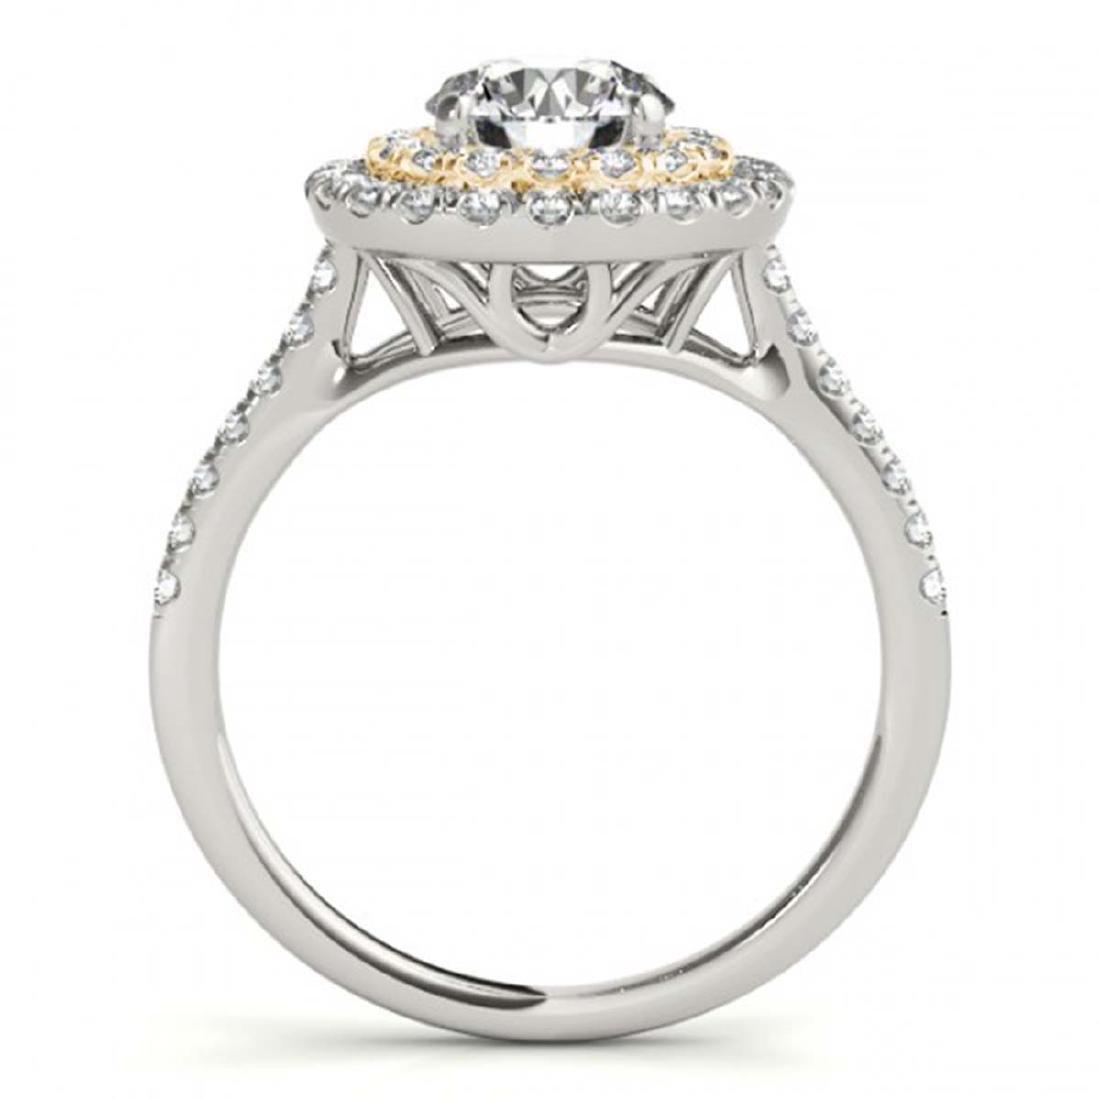 1.25 ctw VS/SI Diamond Solitaire Halo Ring 18K White & - 2